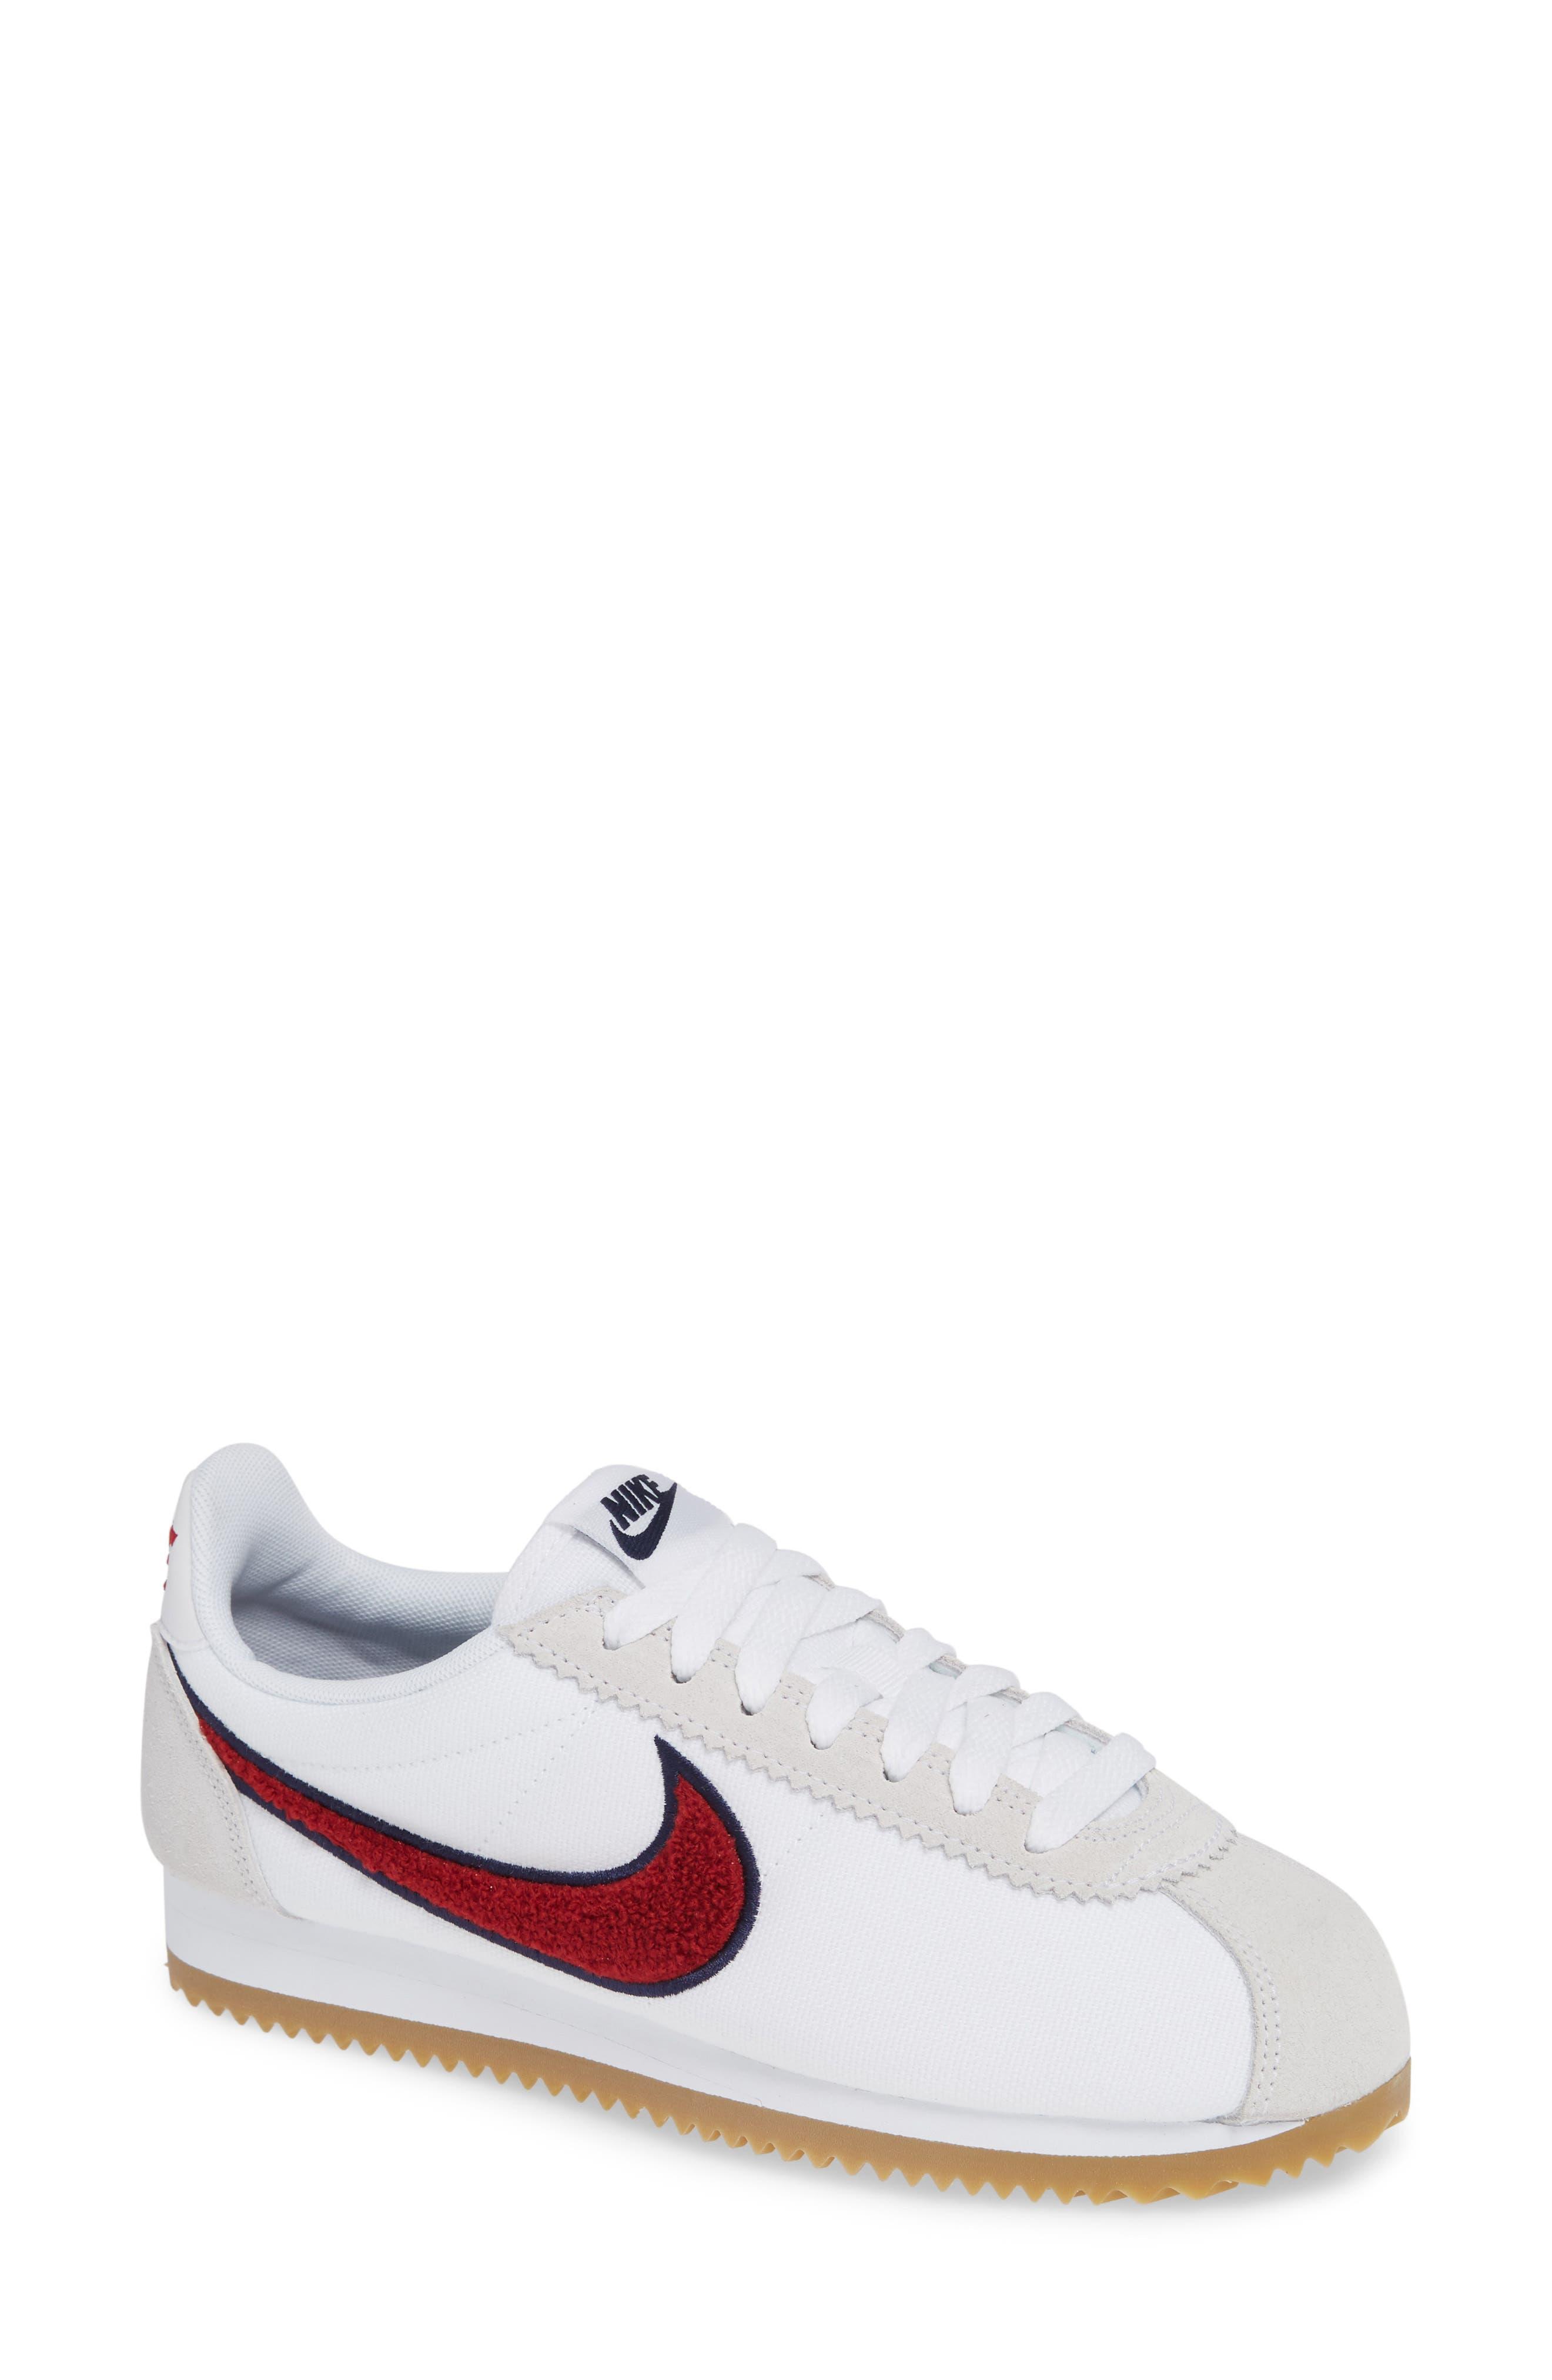 Classic Cortez Premium XLV Sneaker,                             Main thumbnail 1, color,                             WHITE/ RED CRUSH/ LIGHT BROWN